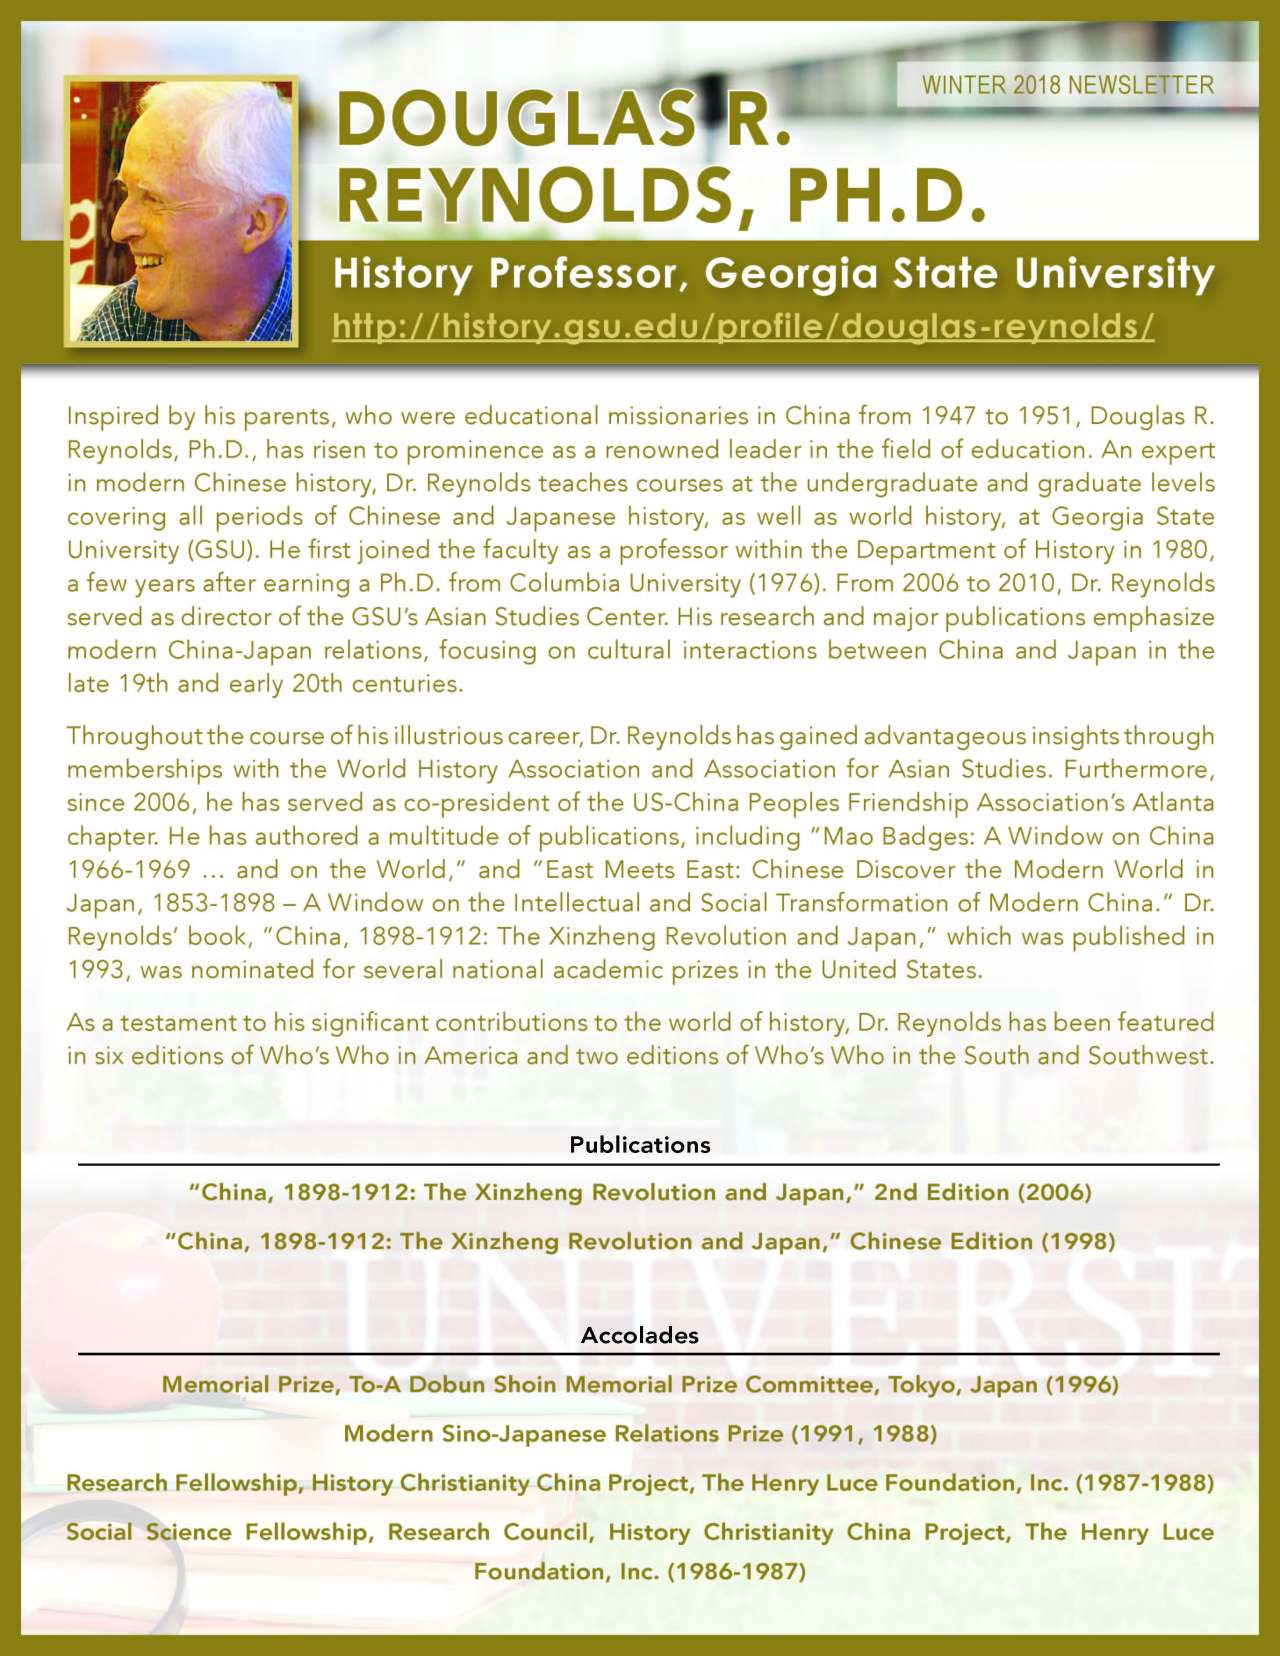 Reynolds, Douglas 2145187_34310379 Newsletter